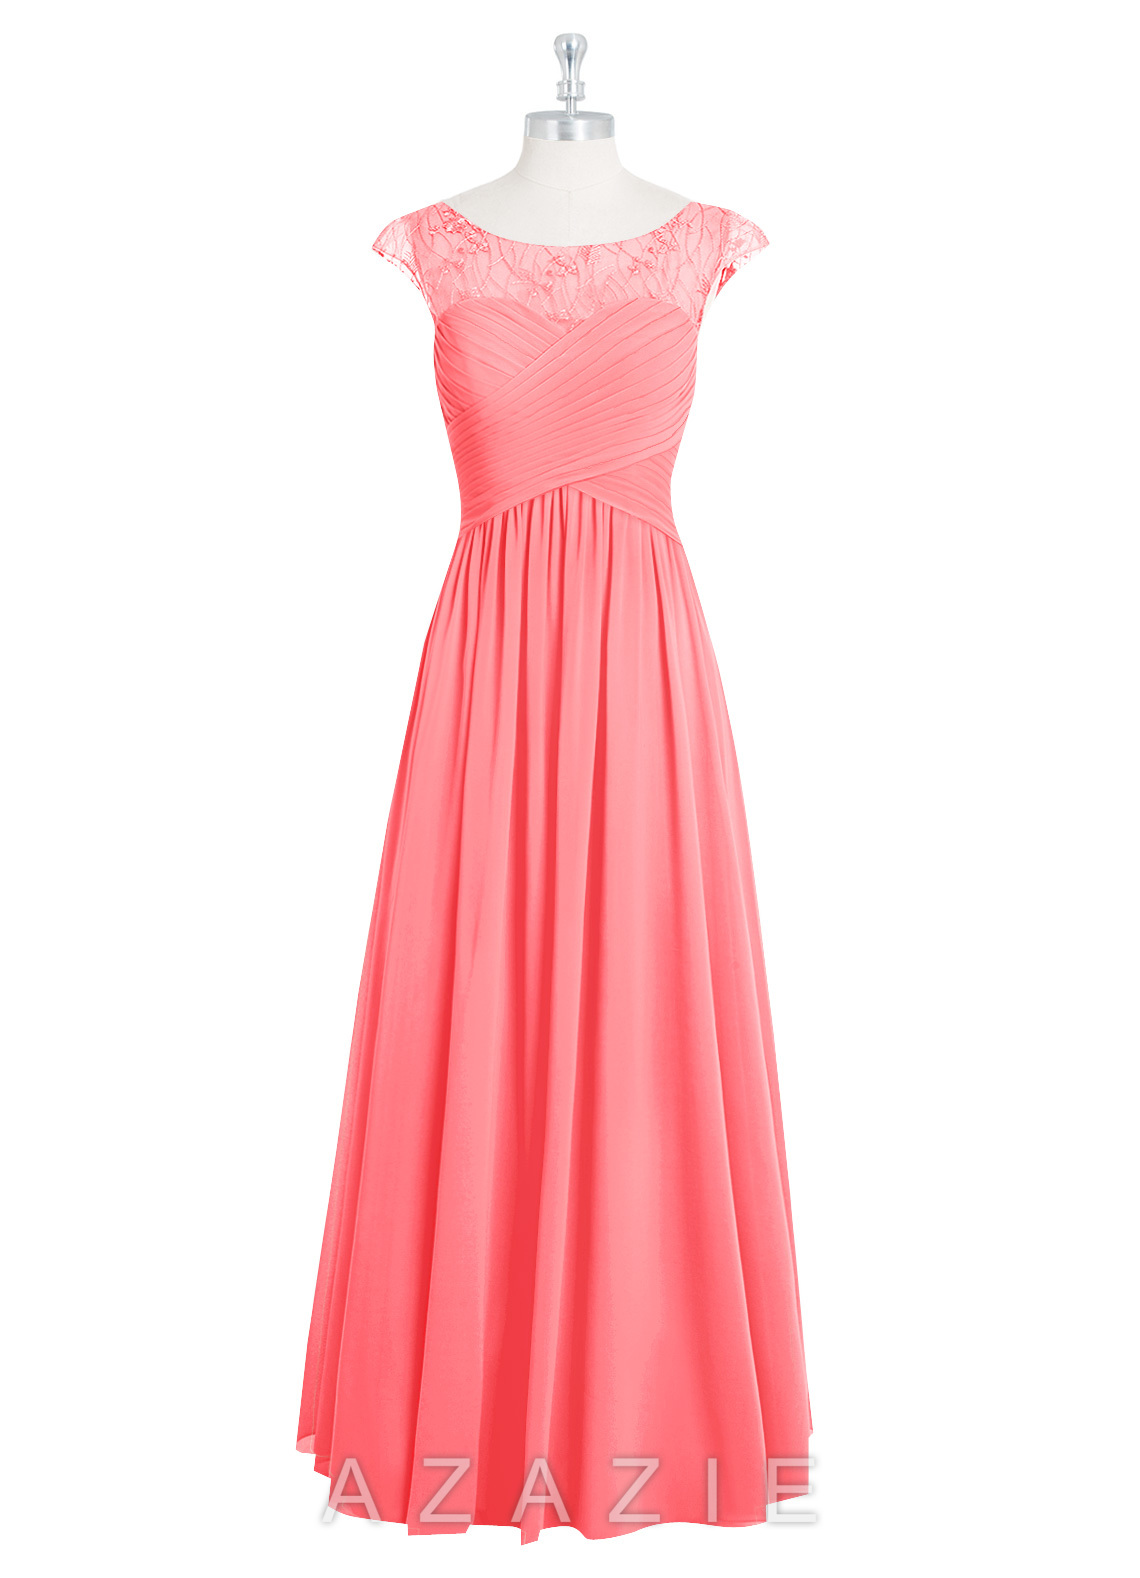 Azazie tobey bridesmaid dress azazie color watermelon ombrellifo Image collections